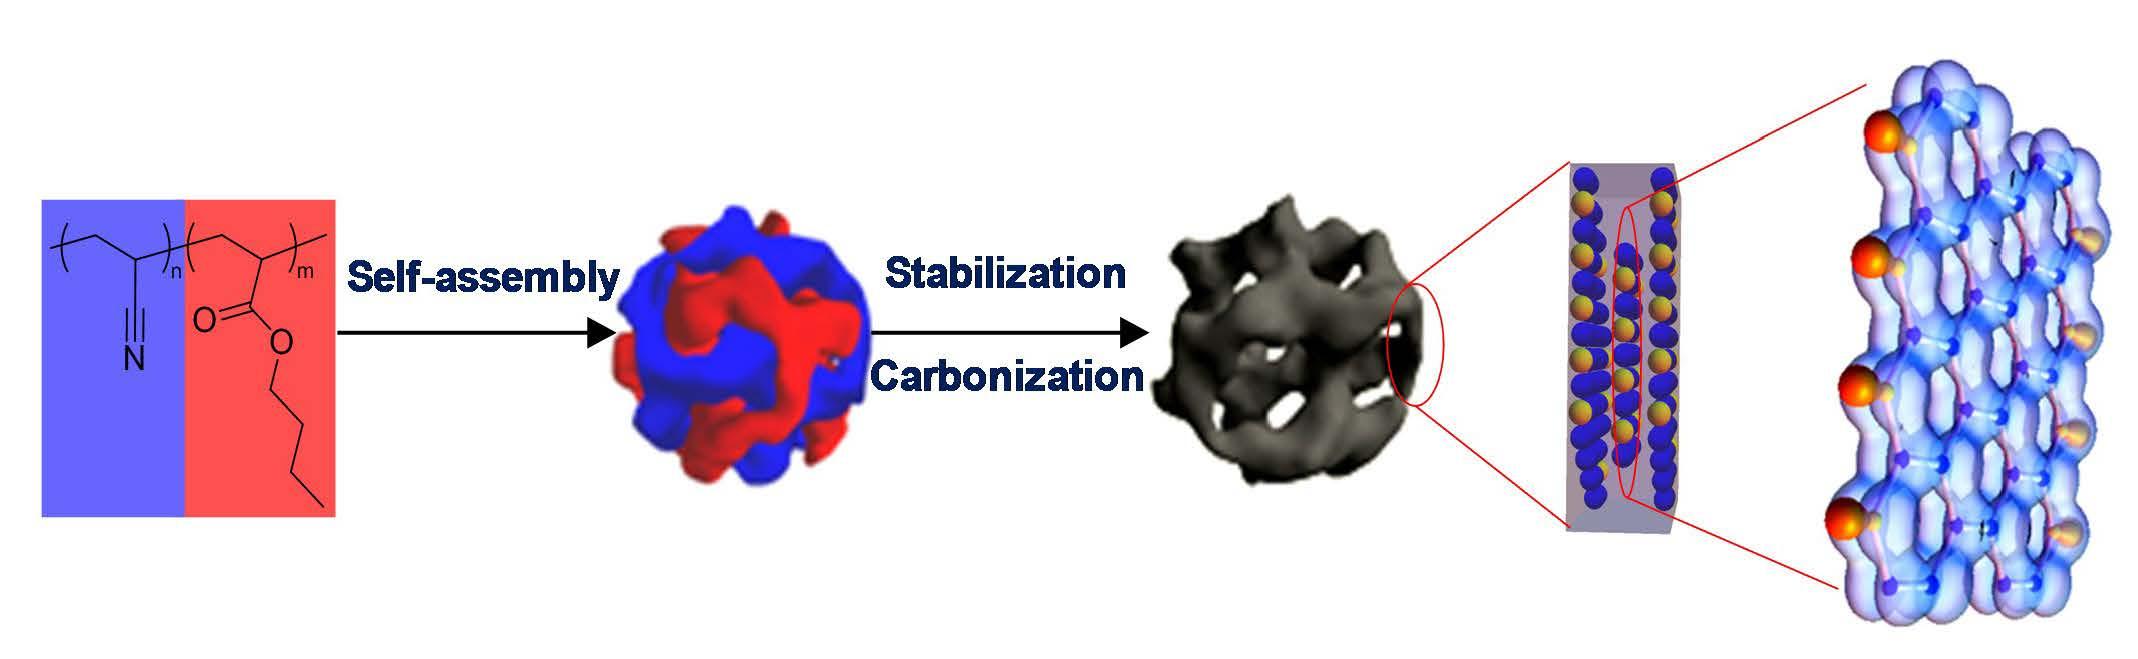 Carbon Nanostructures Matyjaszewski Polymer Group